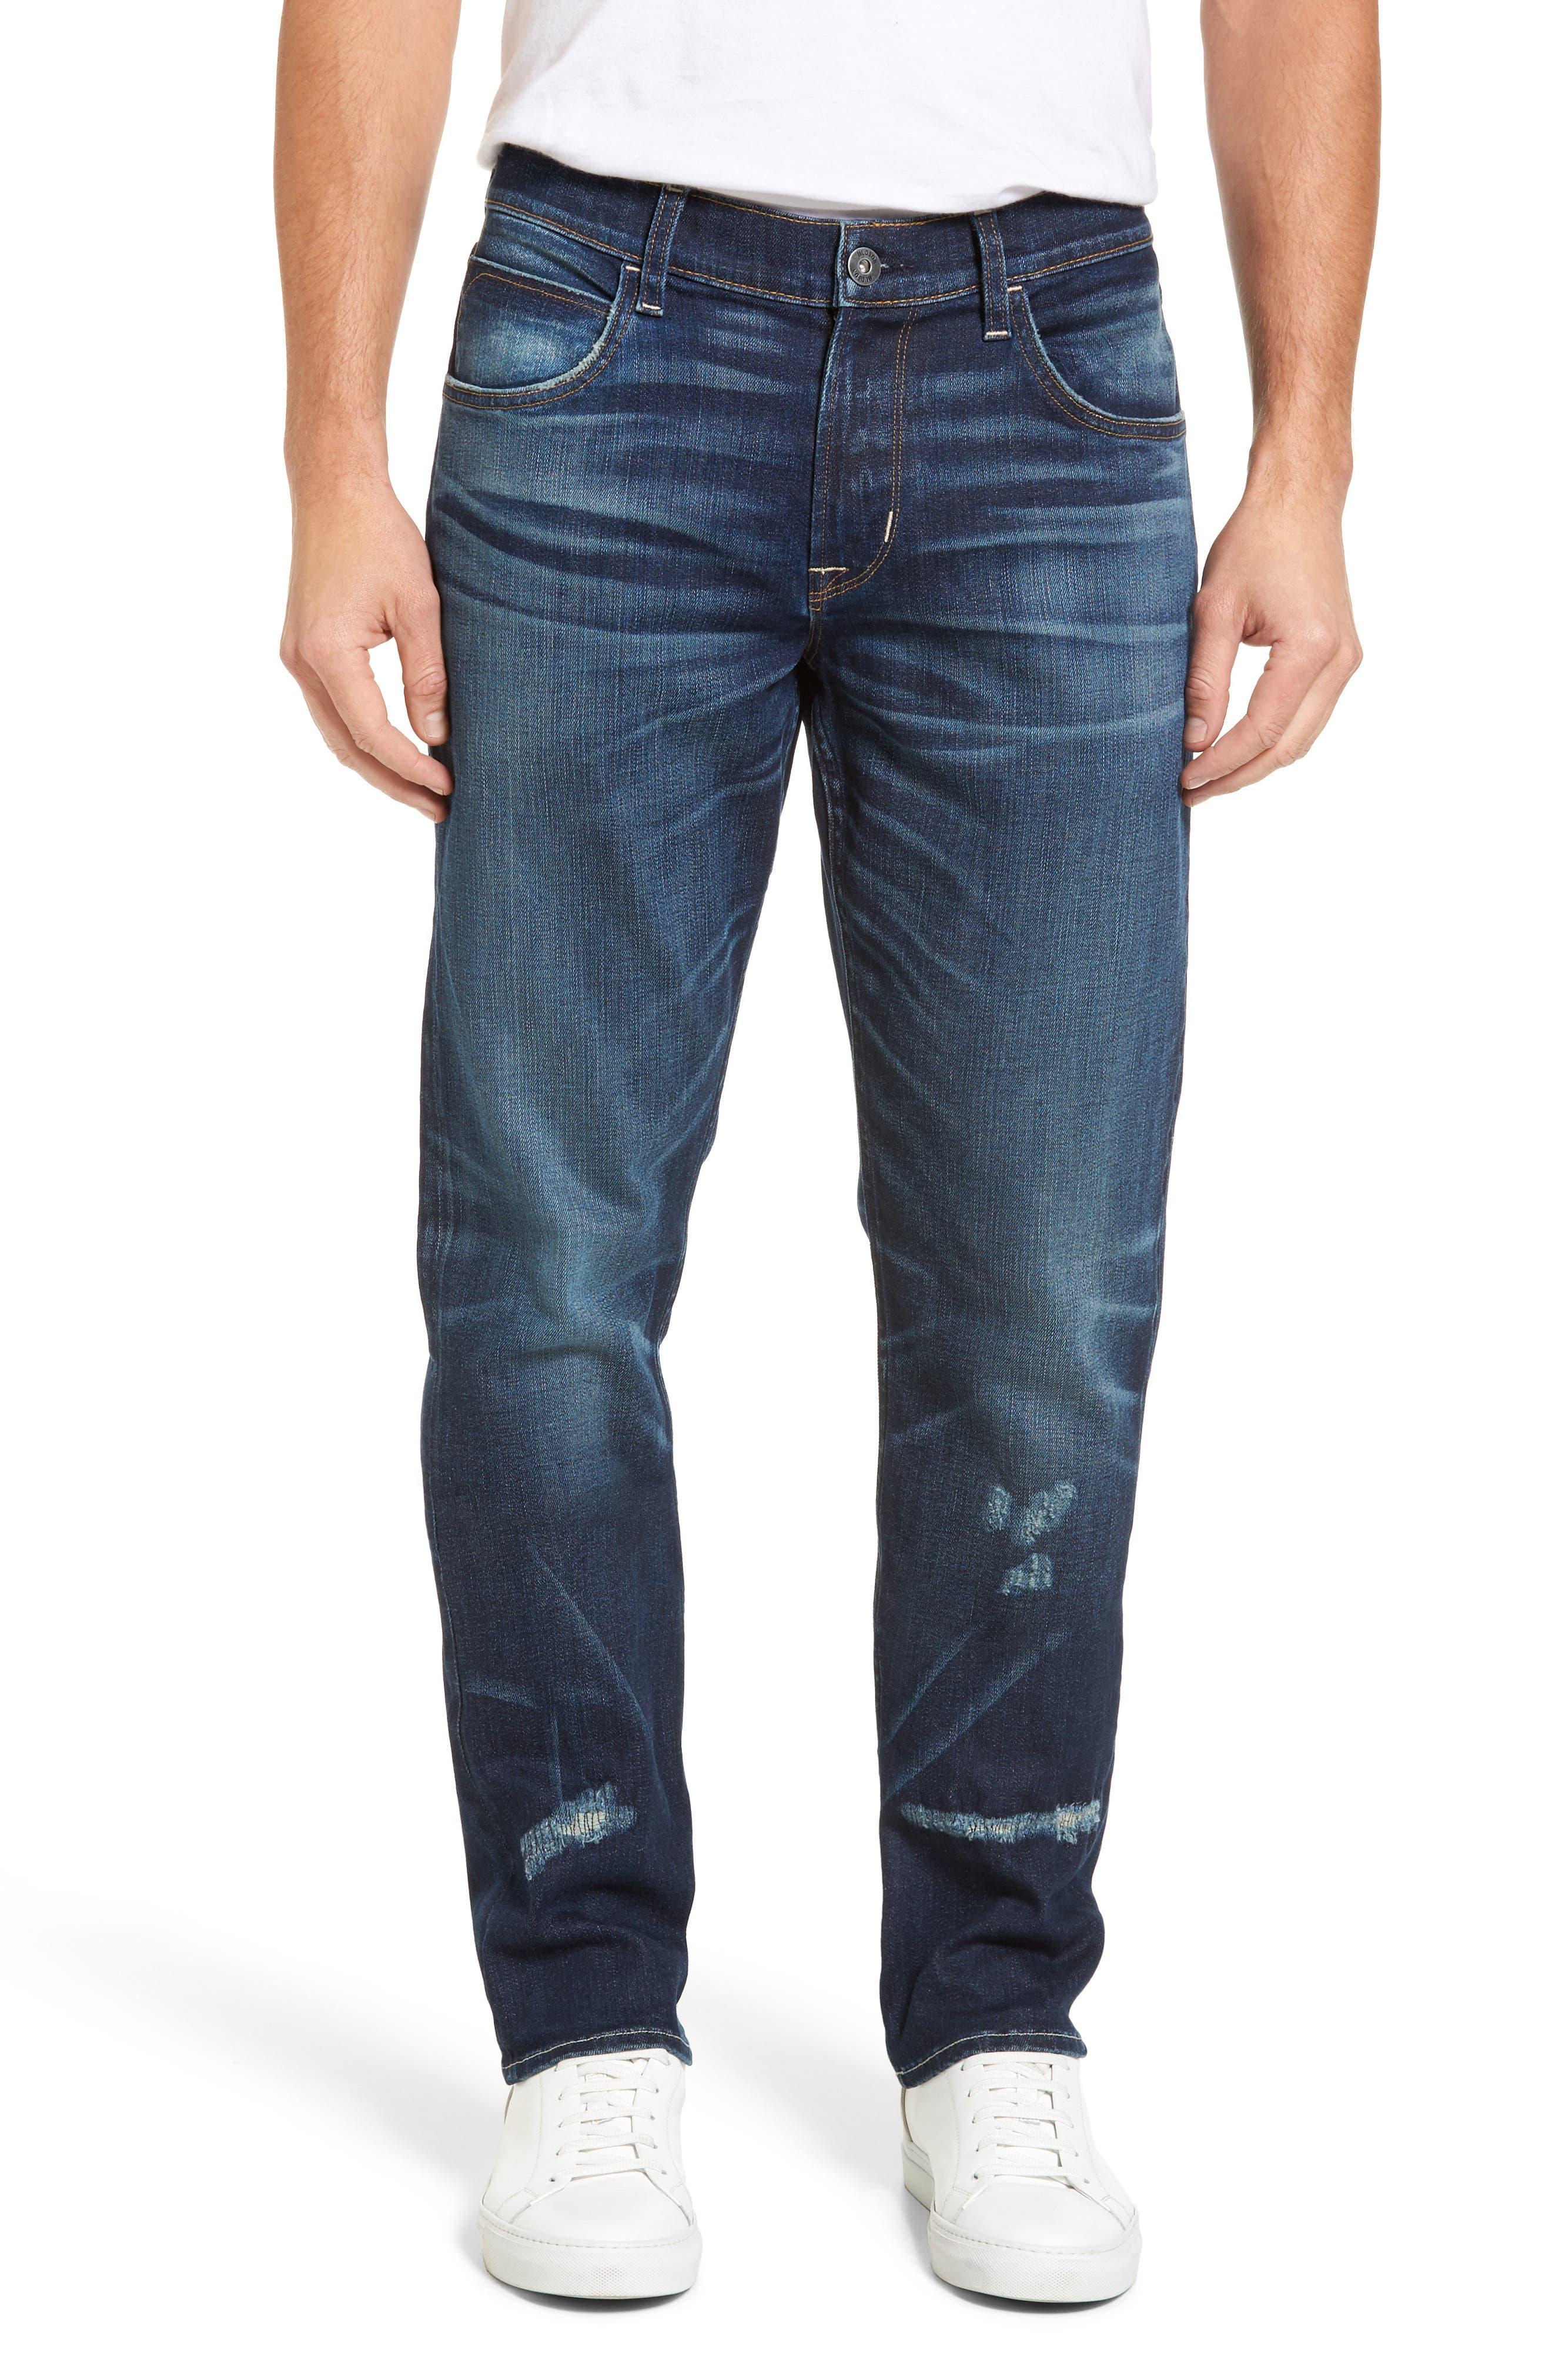 Blake Slim Fit Jeans,                             Main thumbnail 1, color,